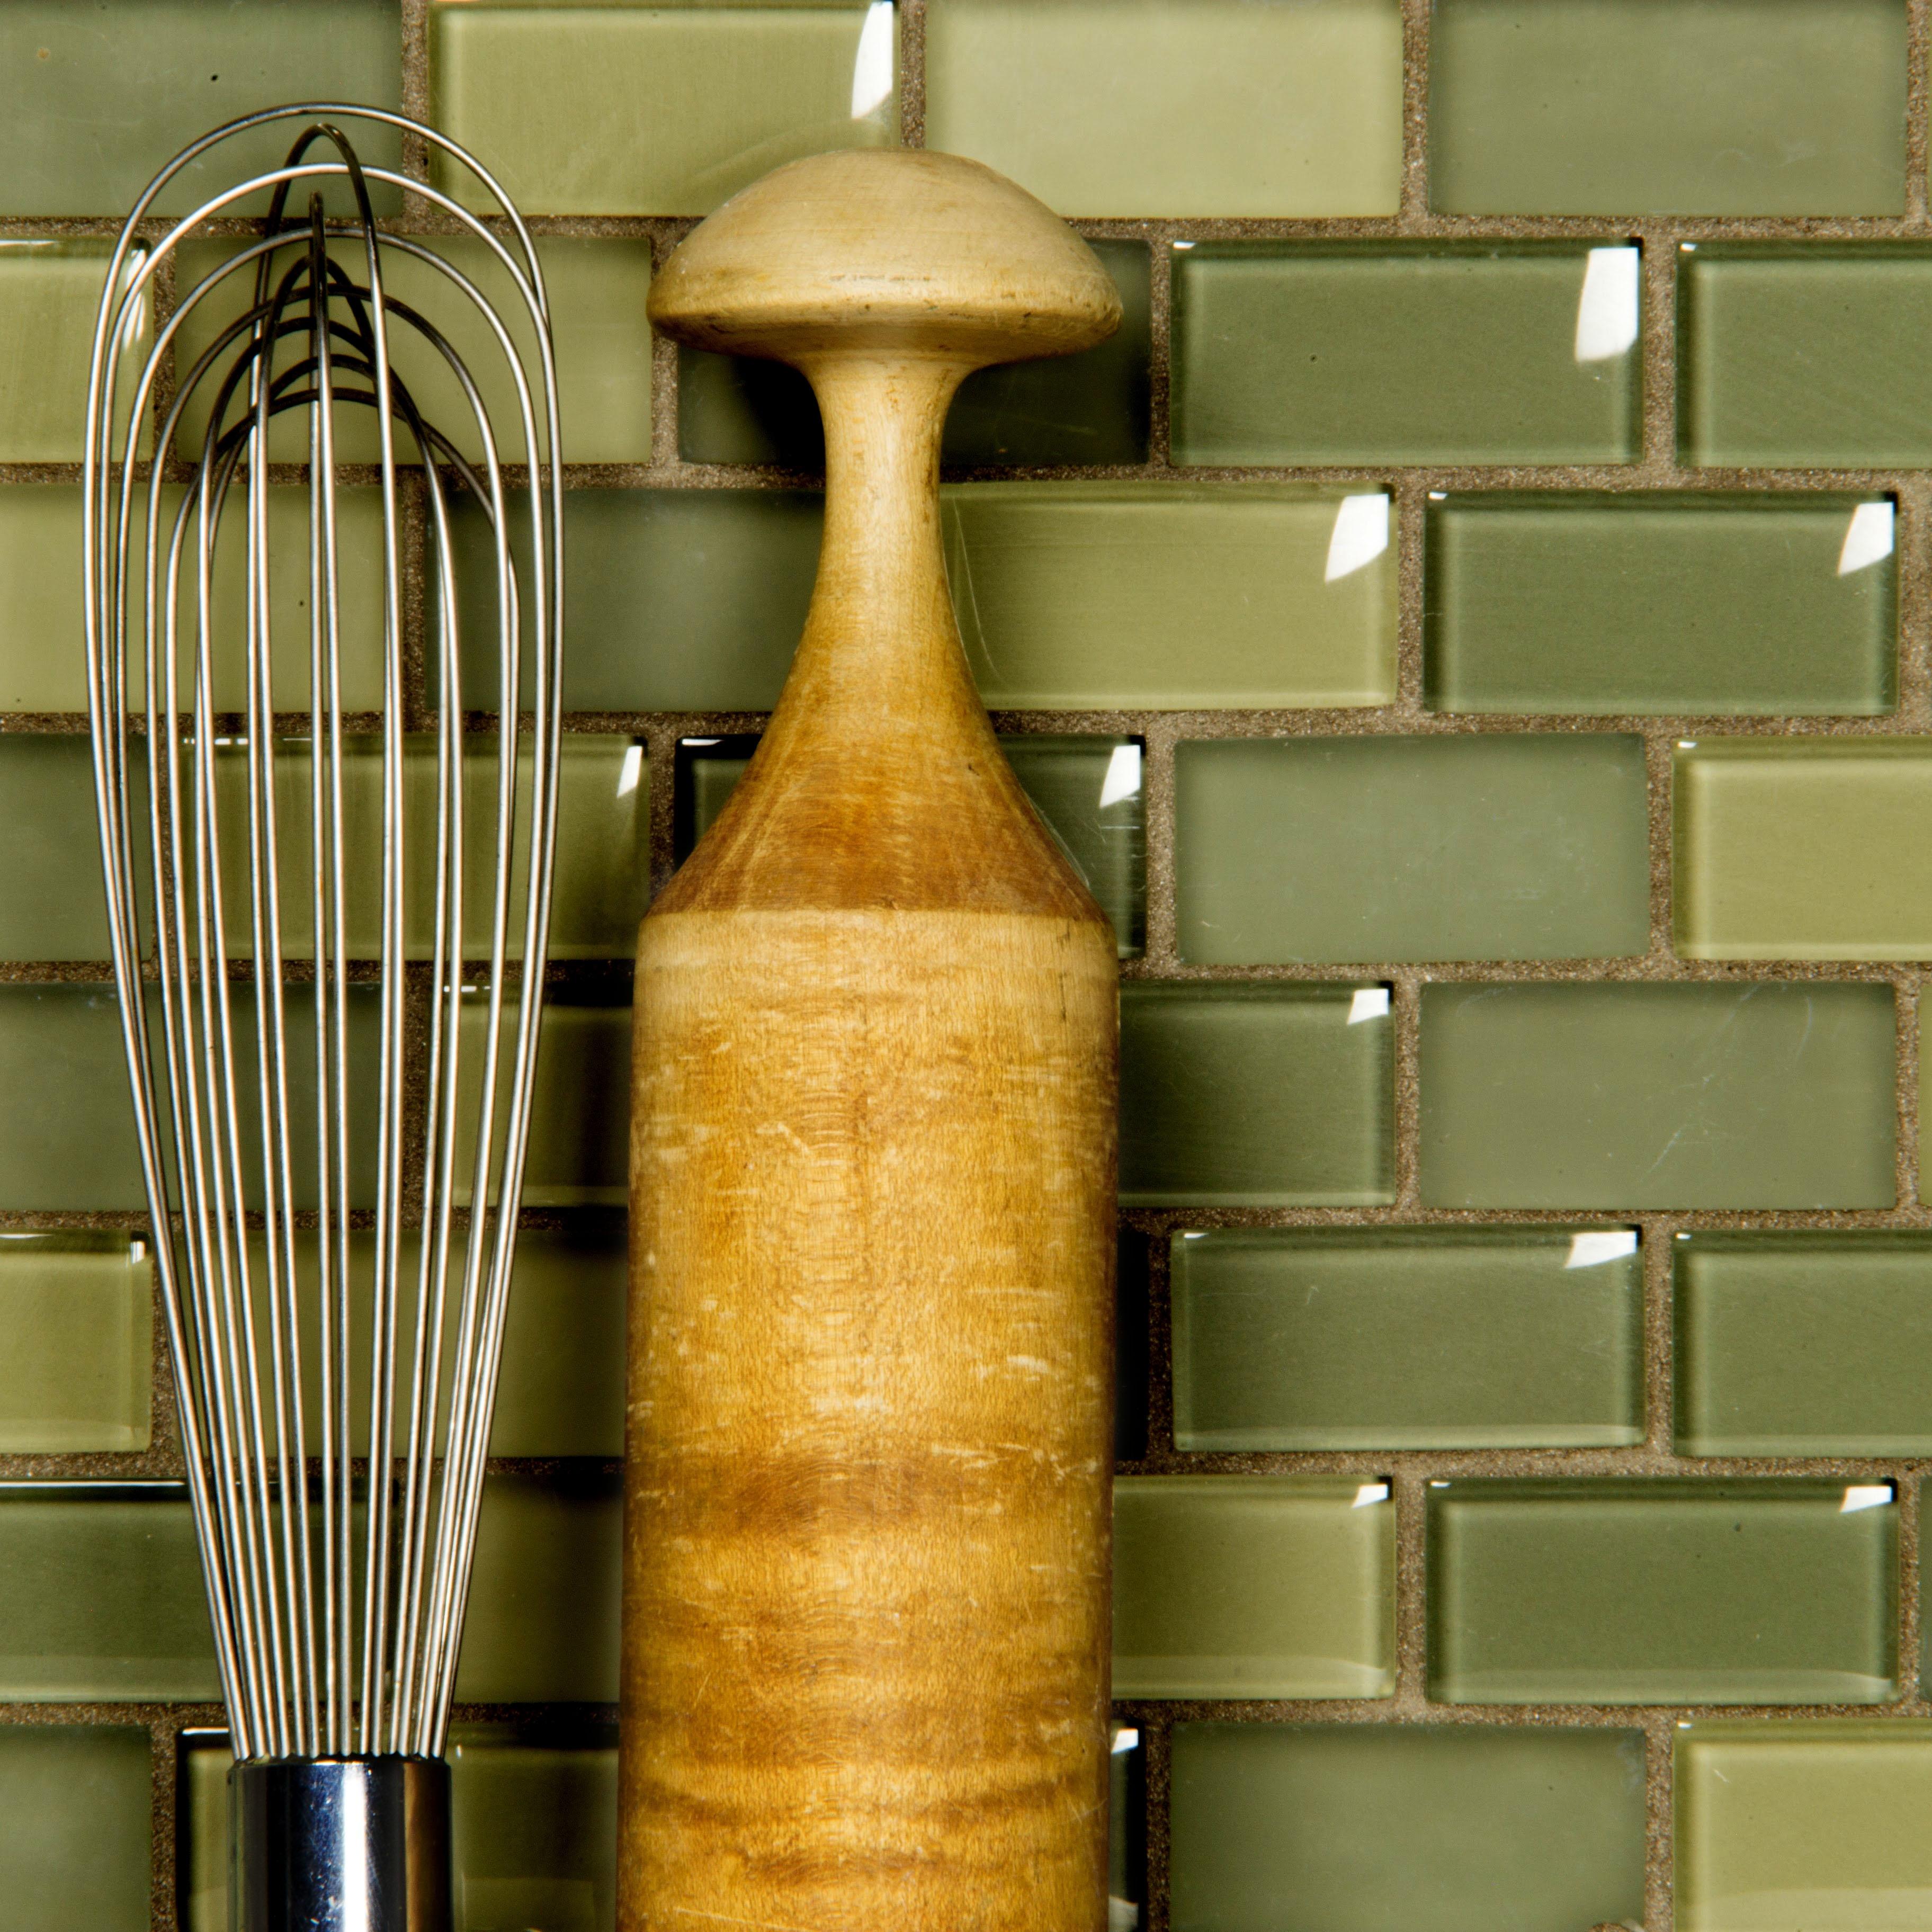 "Free Flow 1"" x 2"" Multi Finish Green Glass Brick Backsplash Mosaic Wall & Floor Tile"